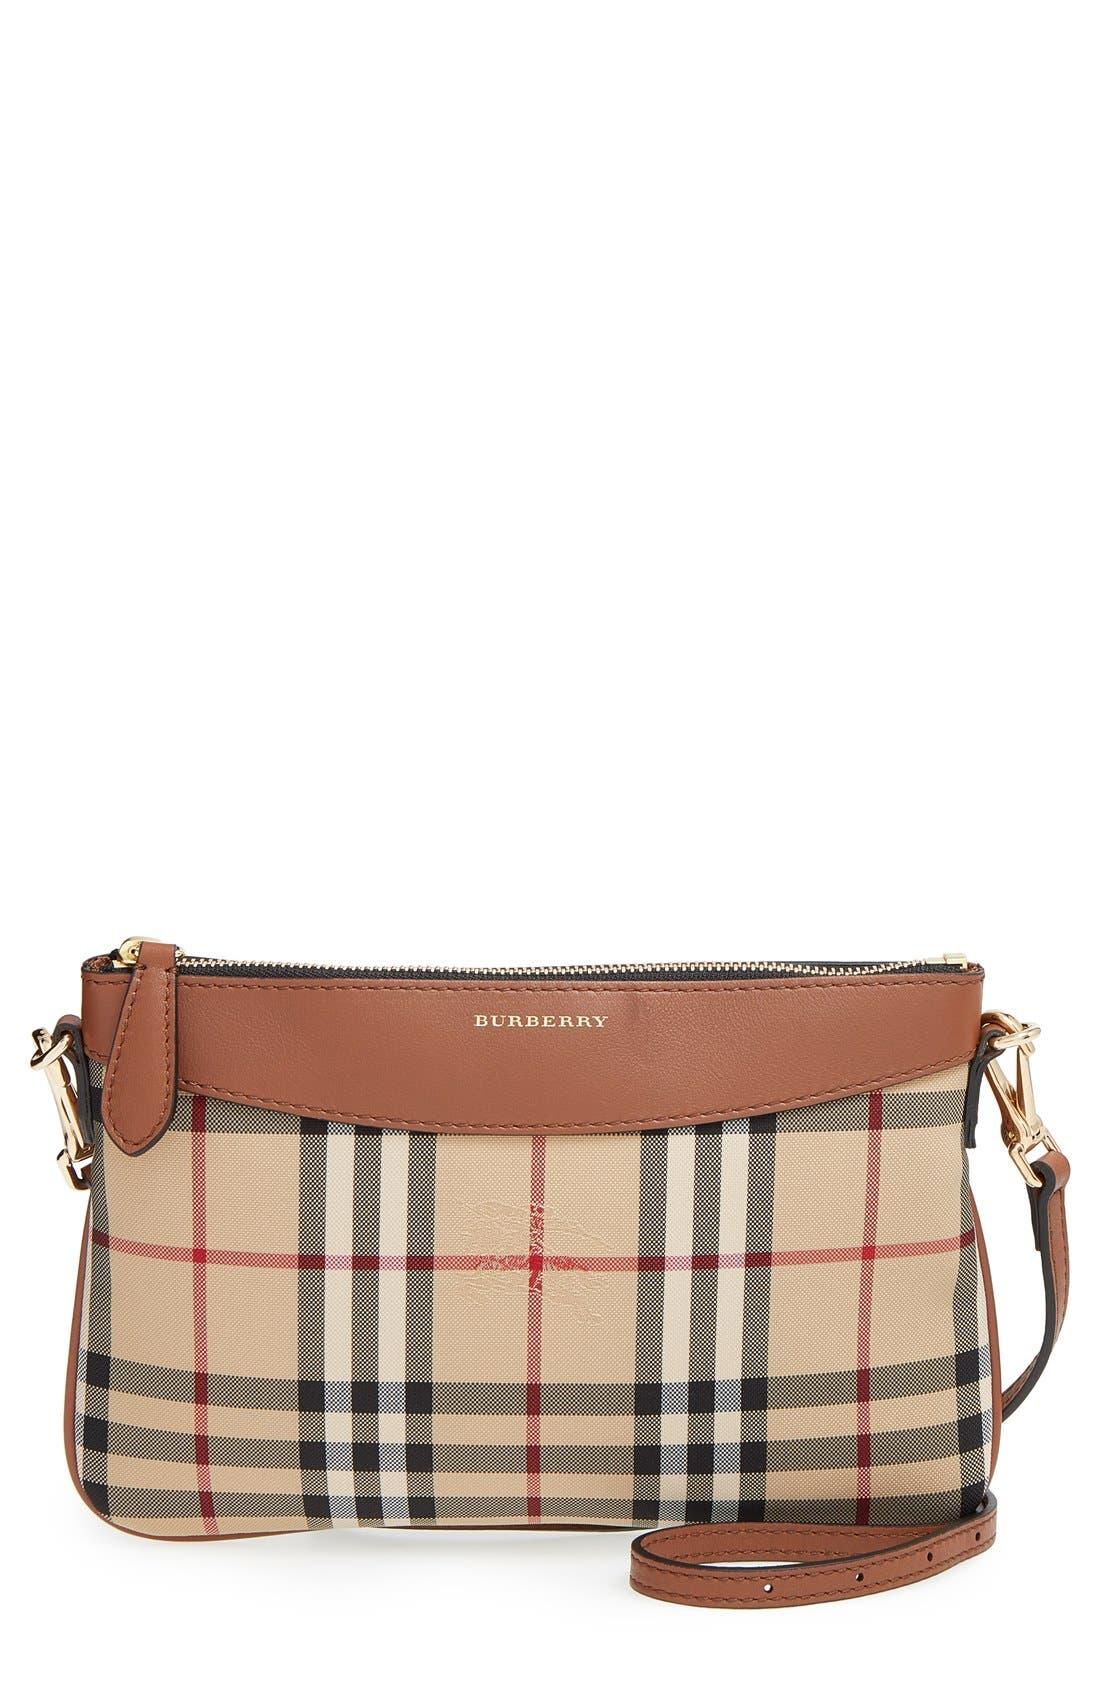 Alternate Image 1 Selected - Burberry 'Peyton - Horseferry Check' Crossbody Bag